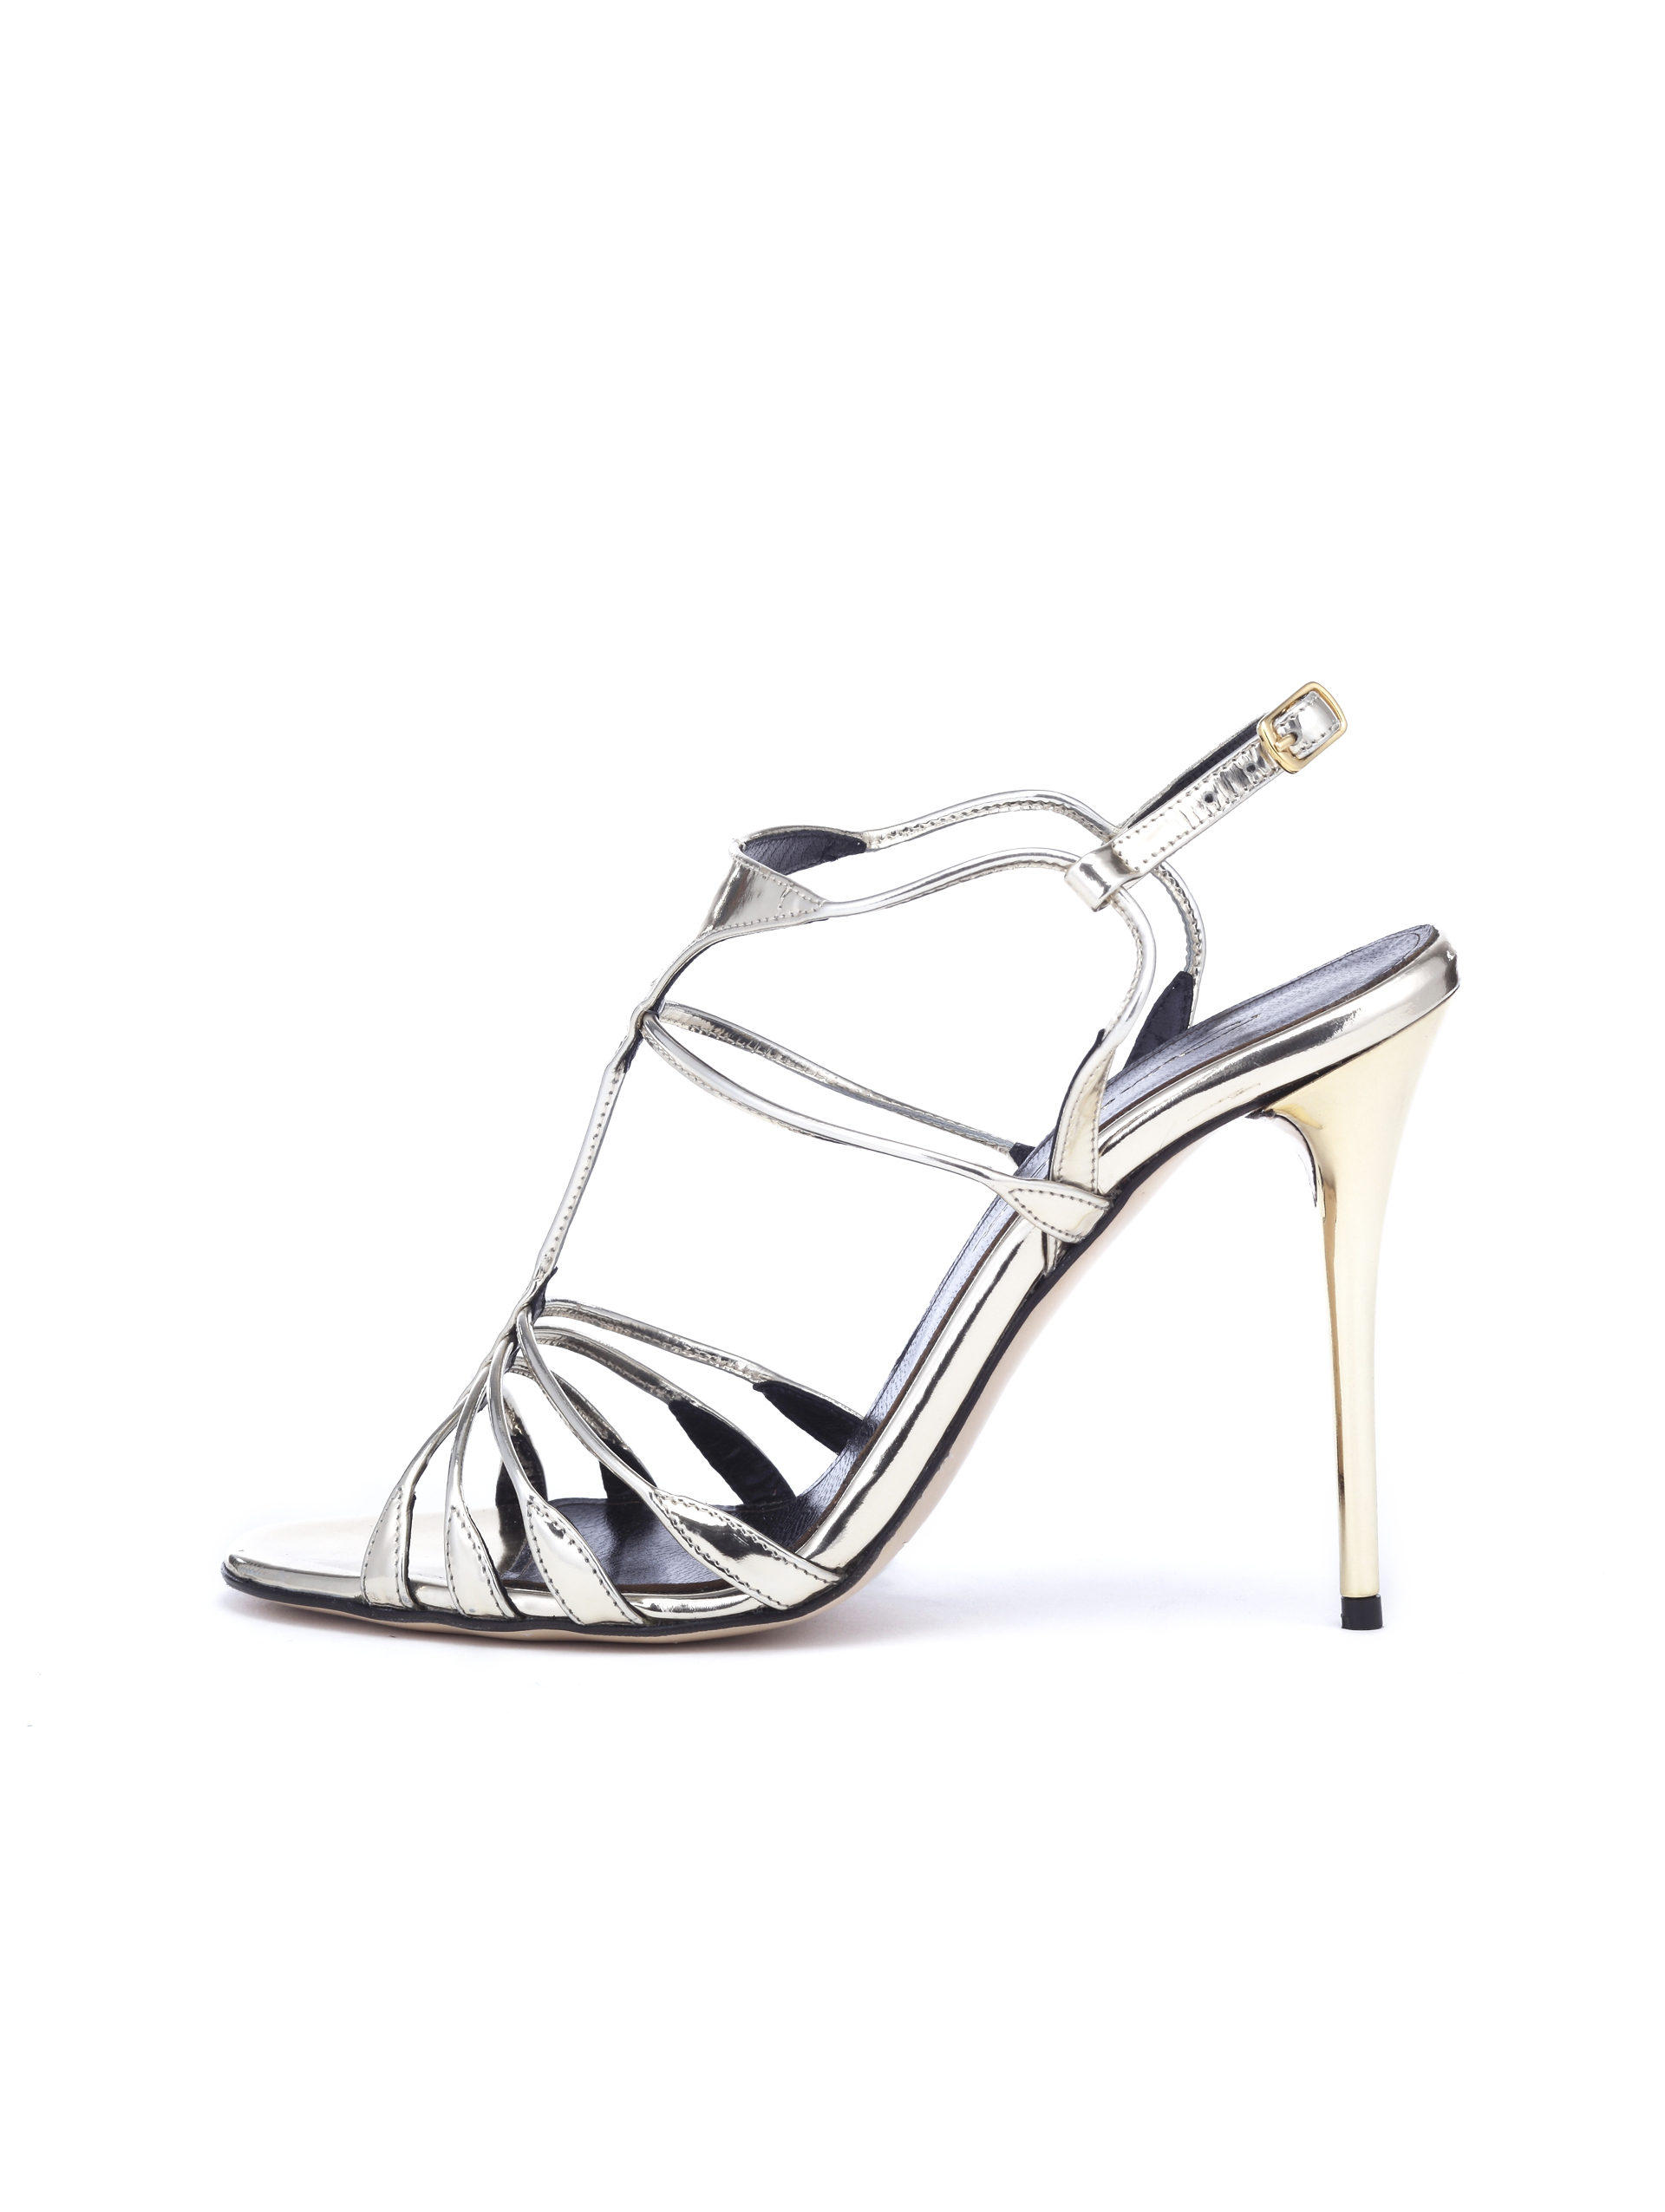 Goat leather work gloves - Oscar De La Renta Platinum Specchio Noelia Sandals In Metallic Lyst